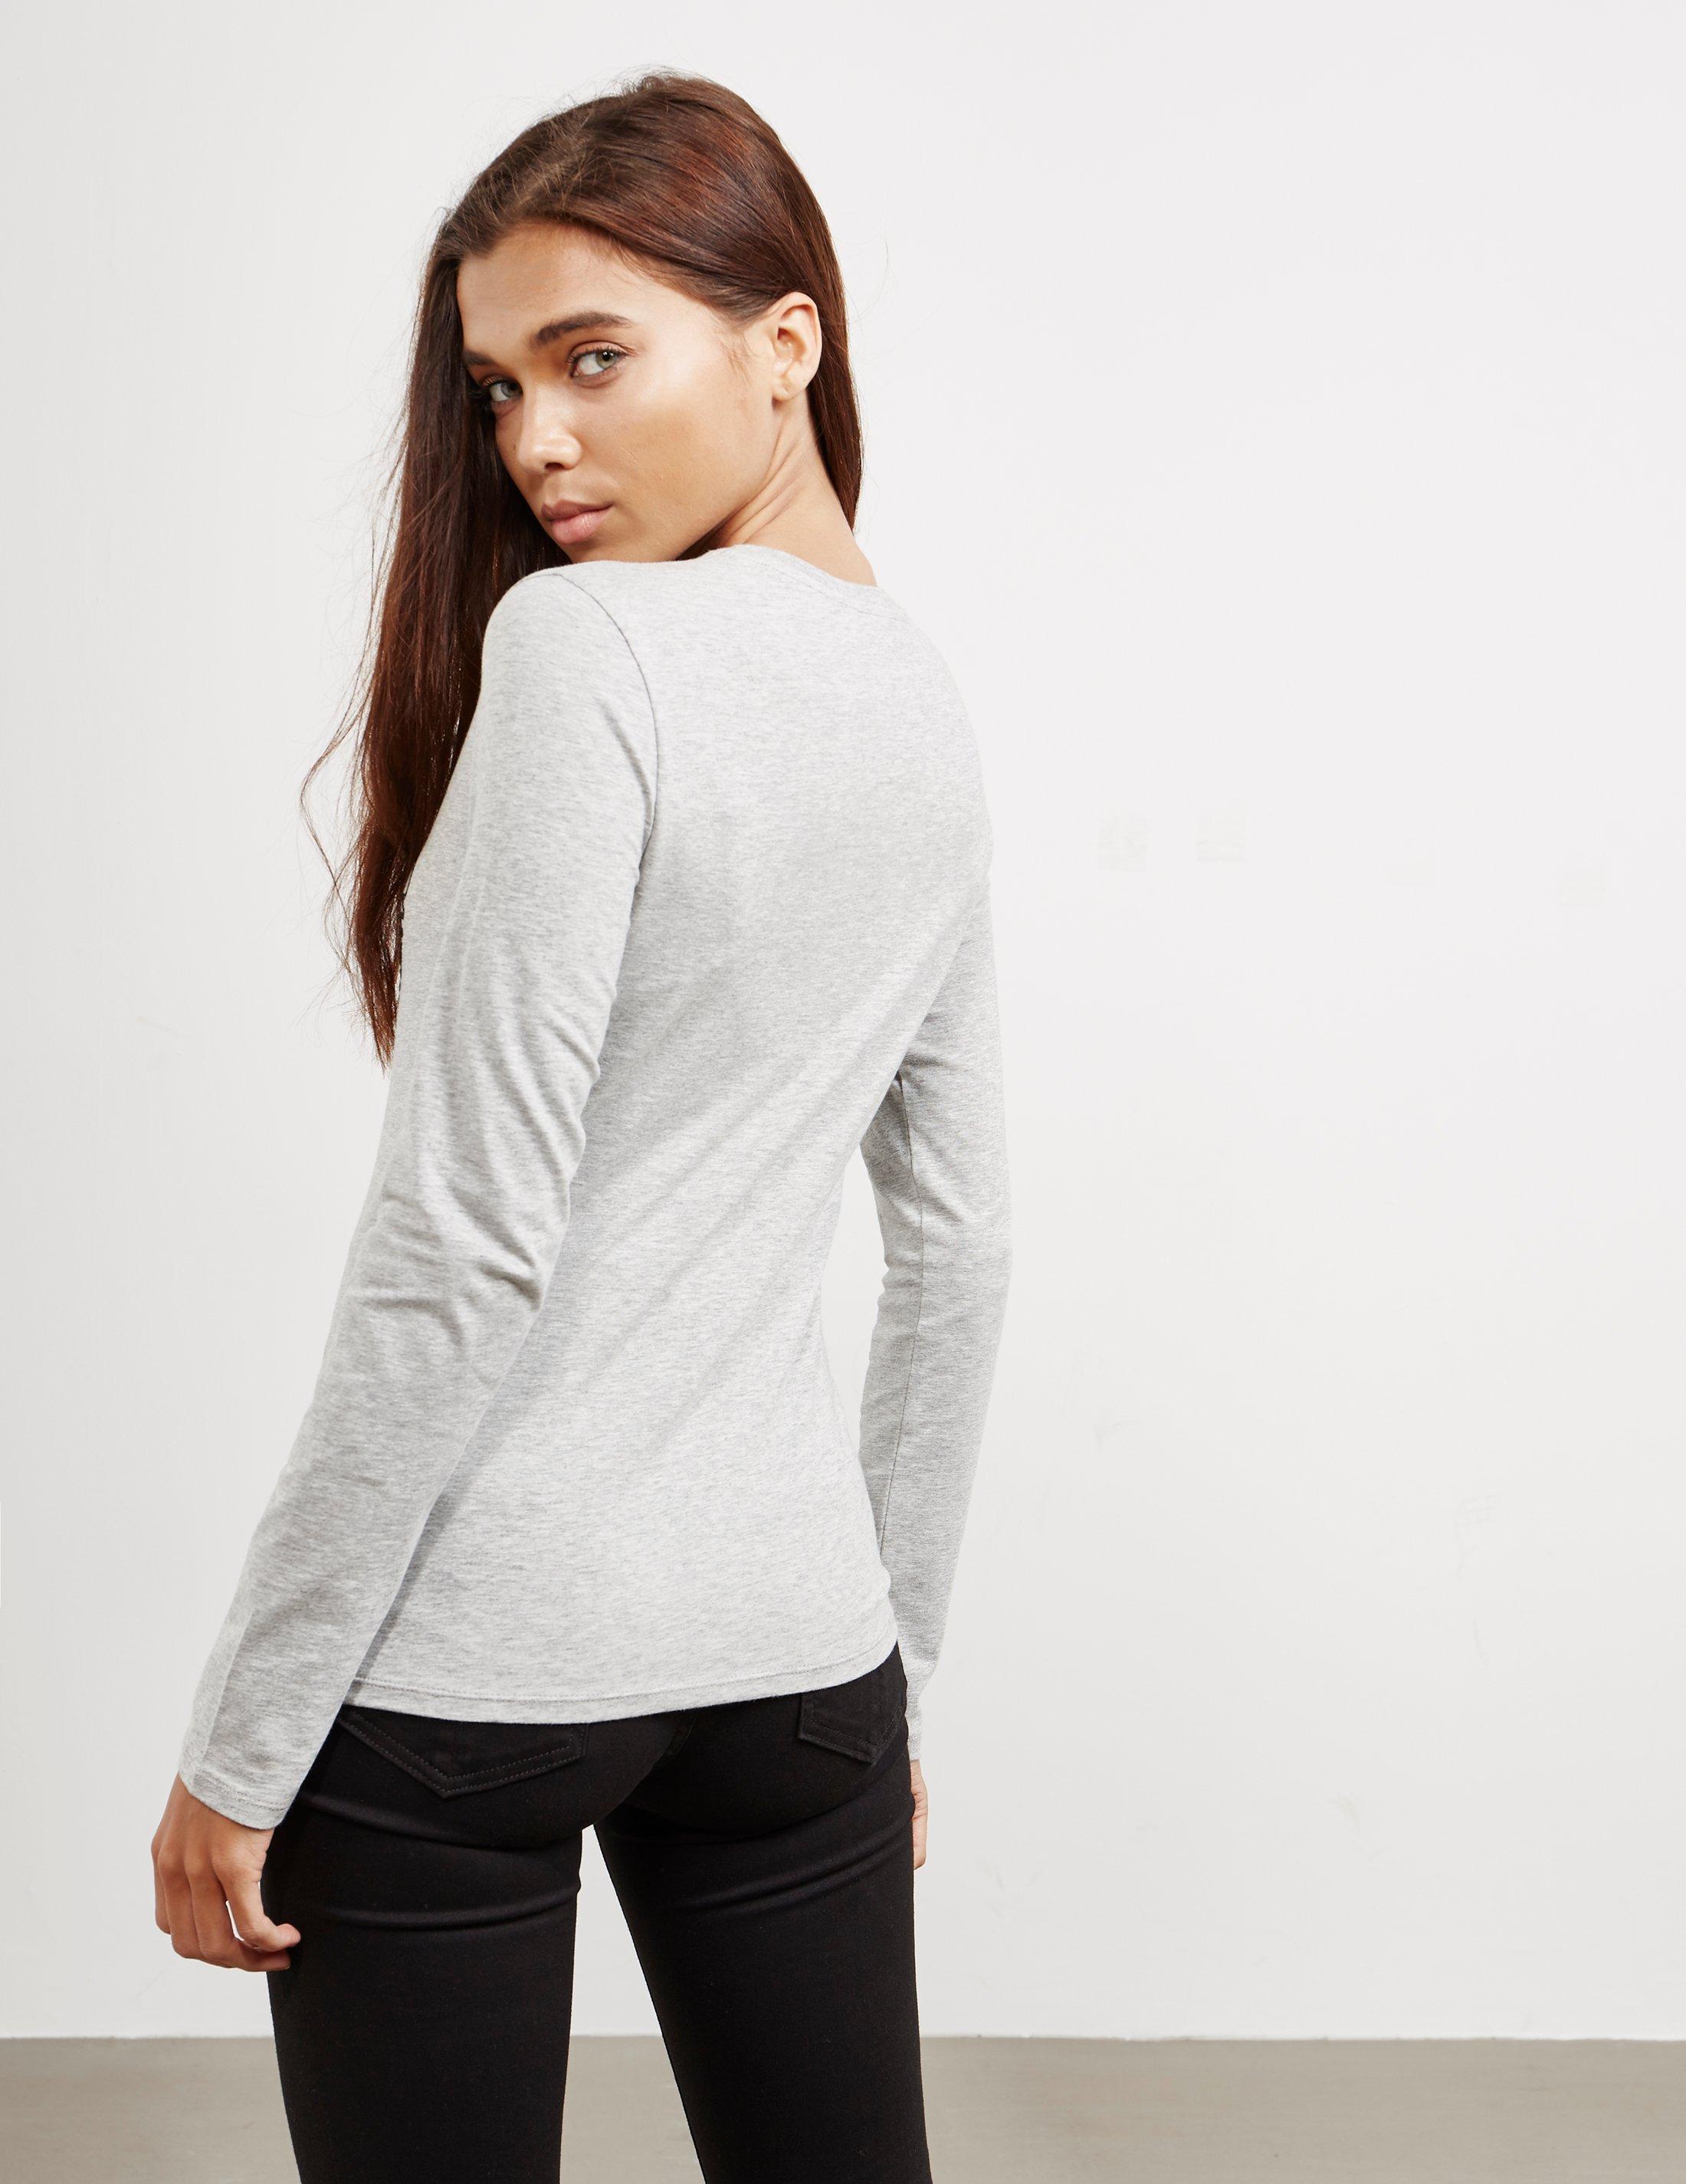 Grey T Armani Heart Long Scribble In Sleeve Emporio Shirt Womens Aqw11F